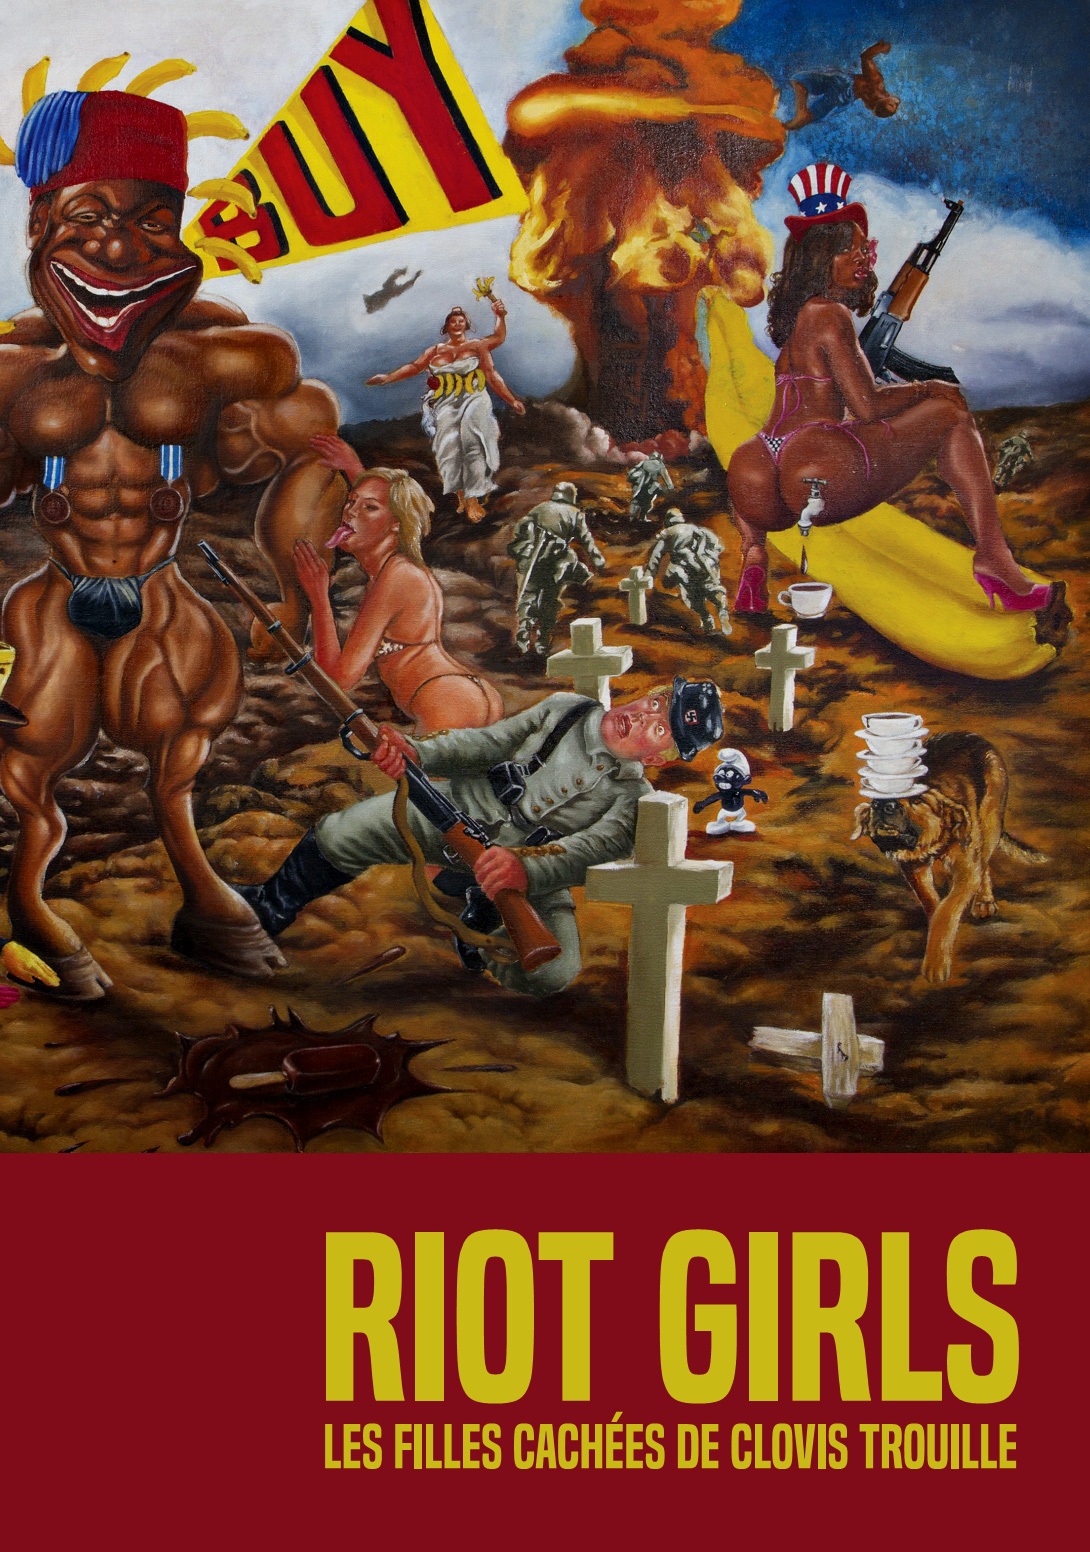 © Riot Girls - visuel Nadia Valentine